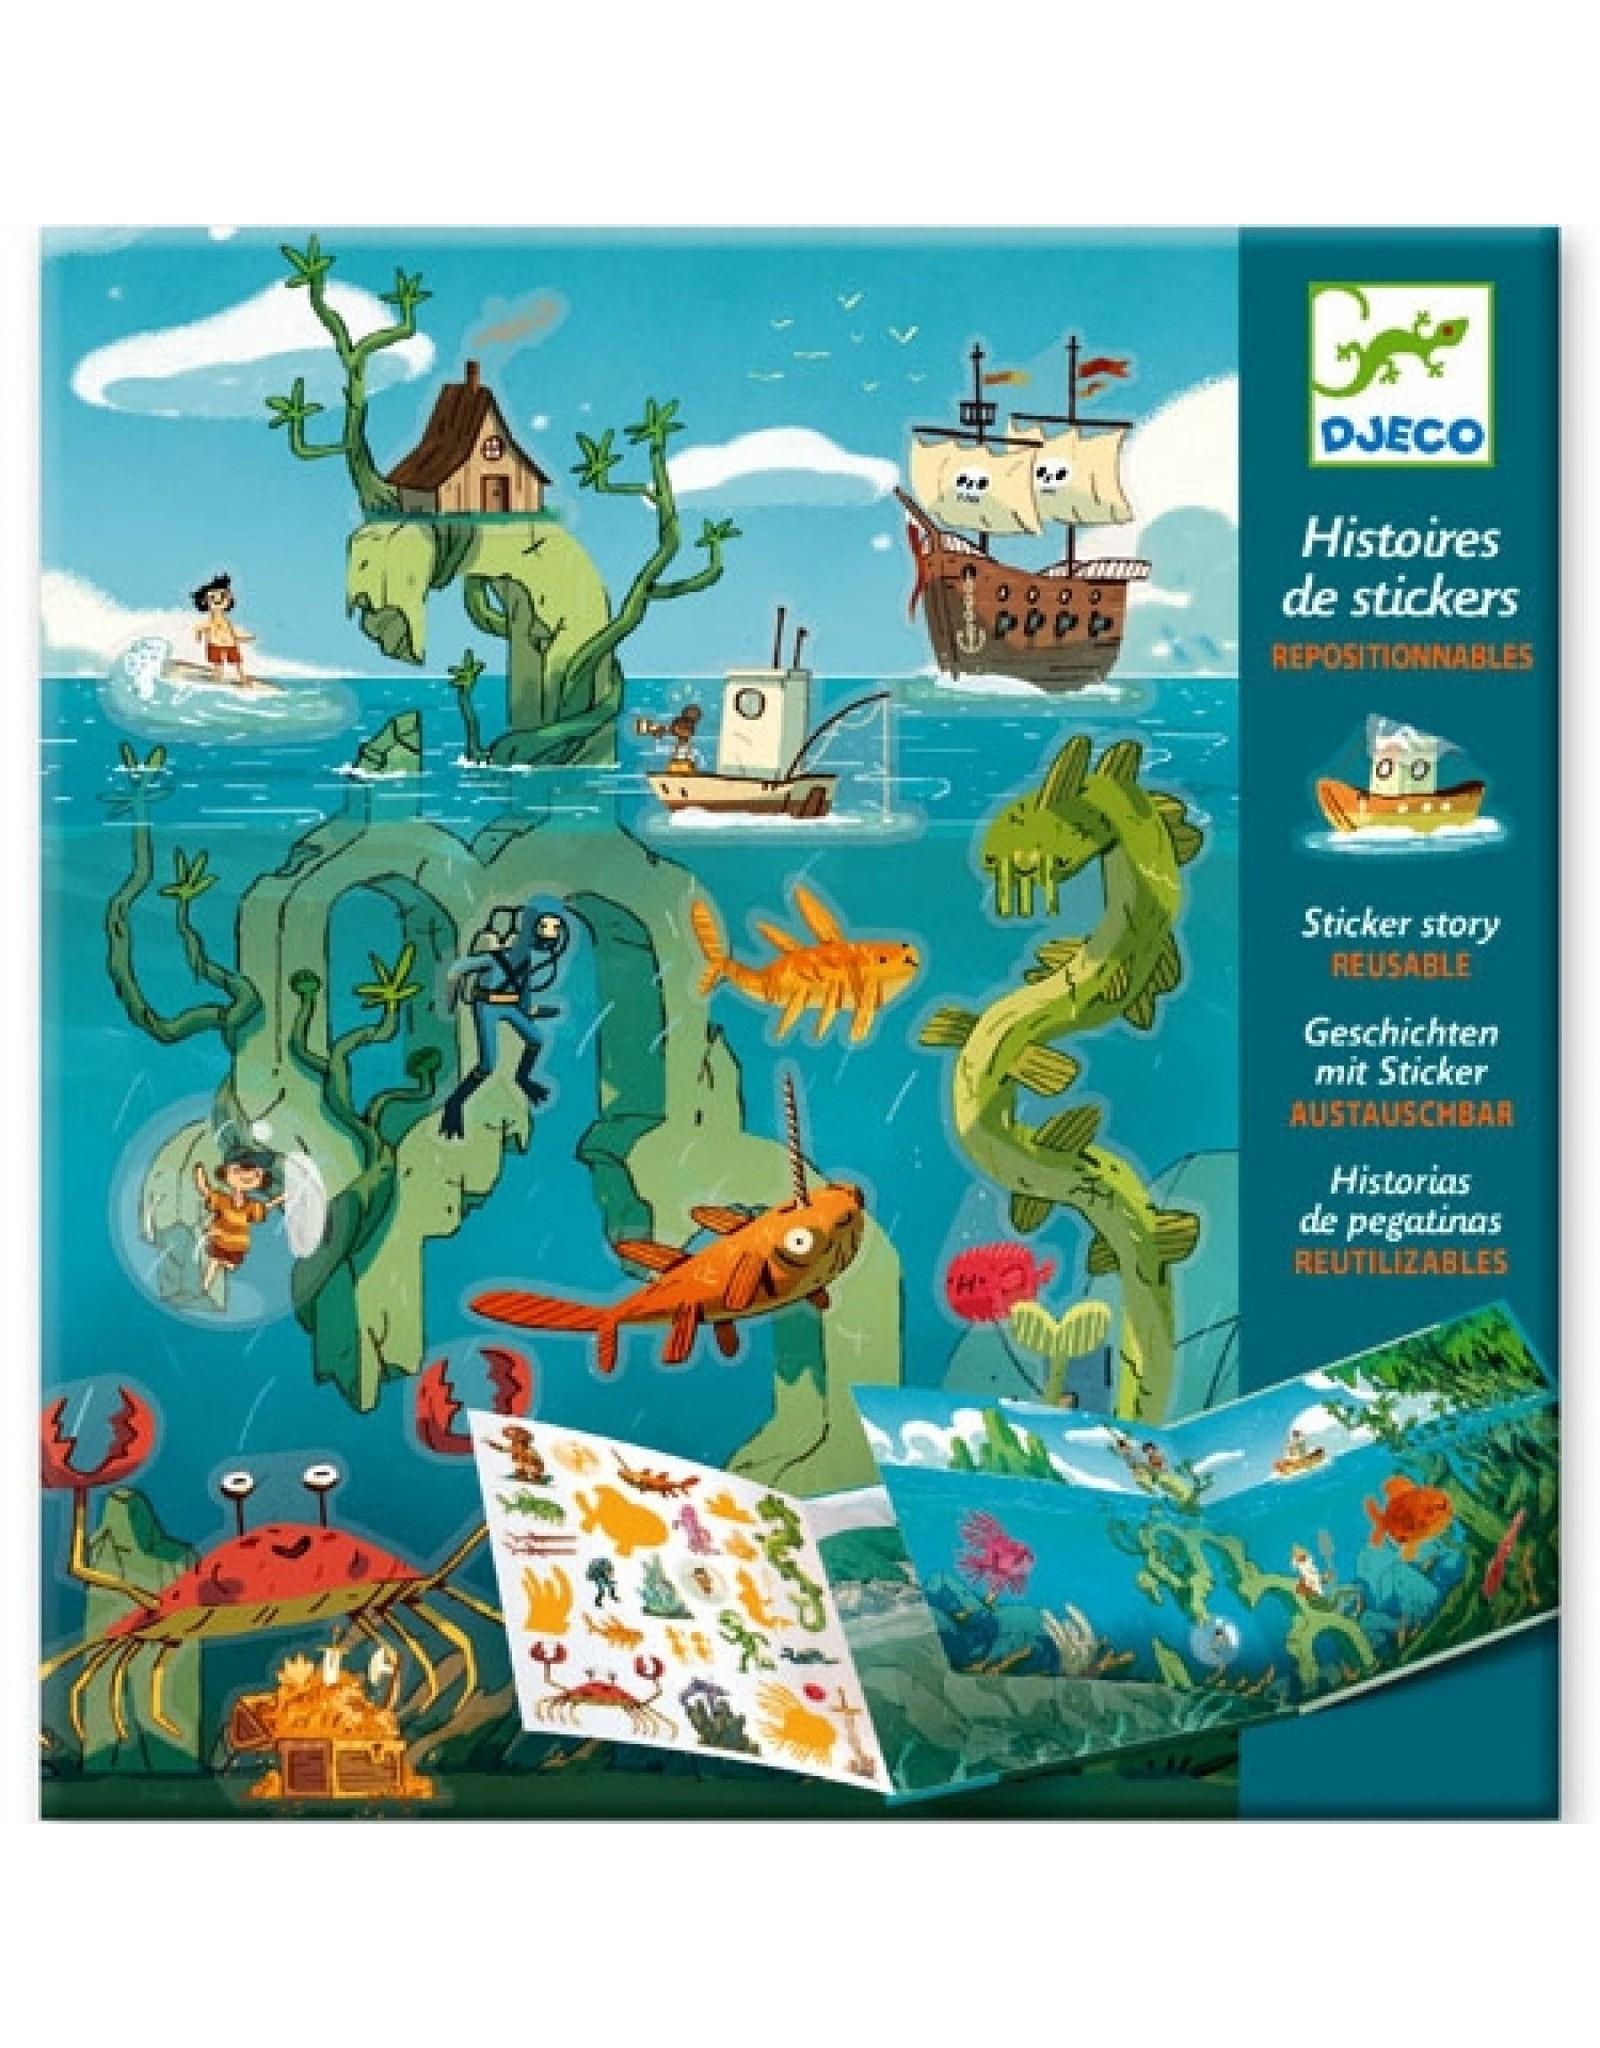 Djeco Sticker Story Adventures at Sea DJ08953